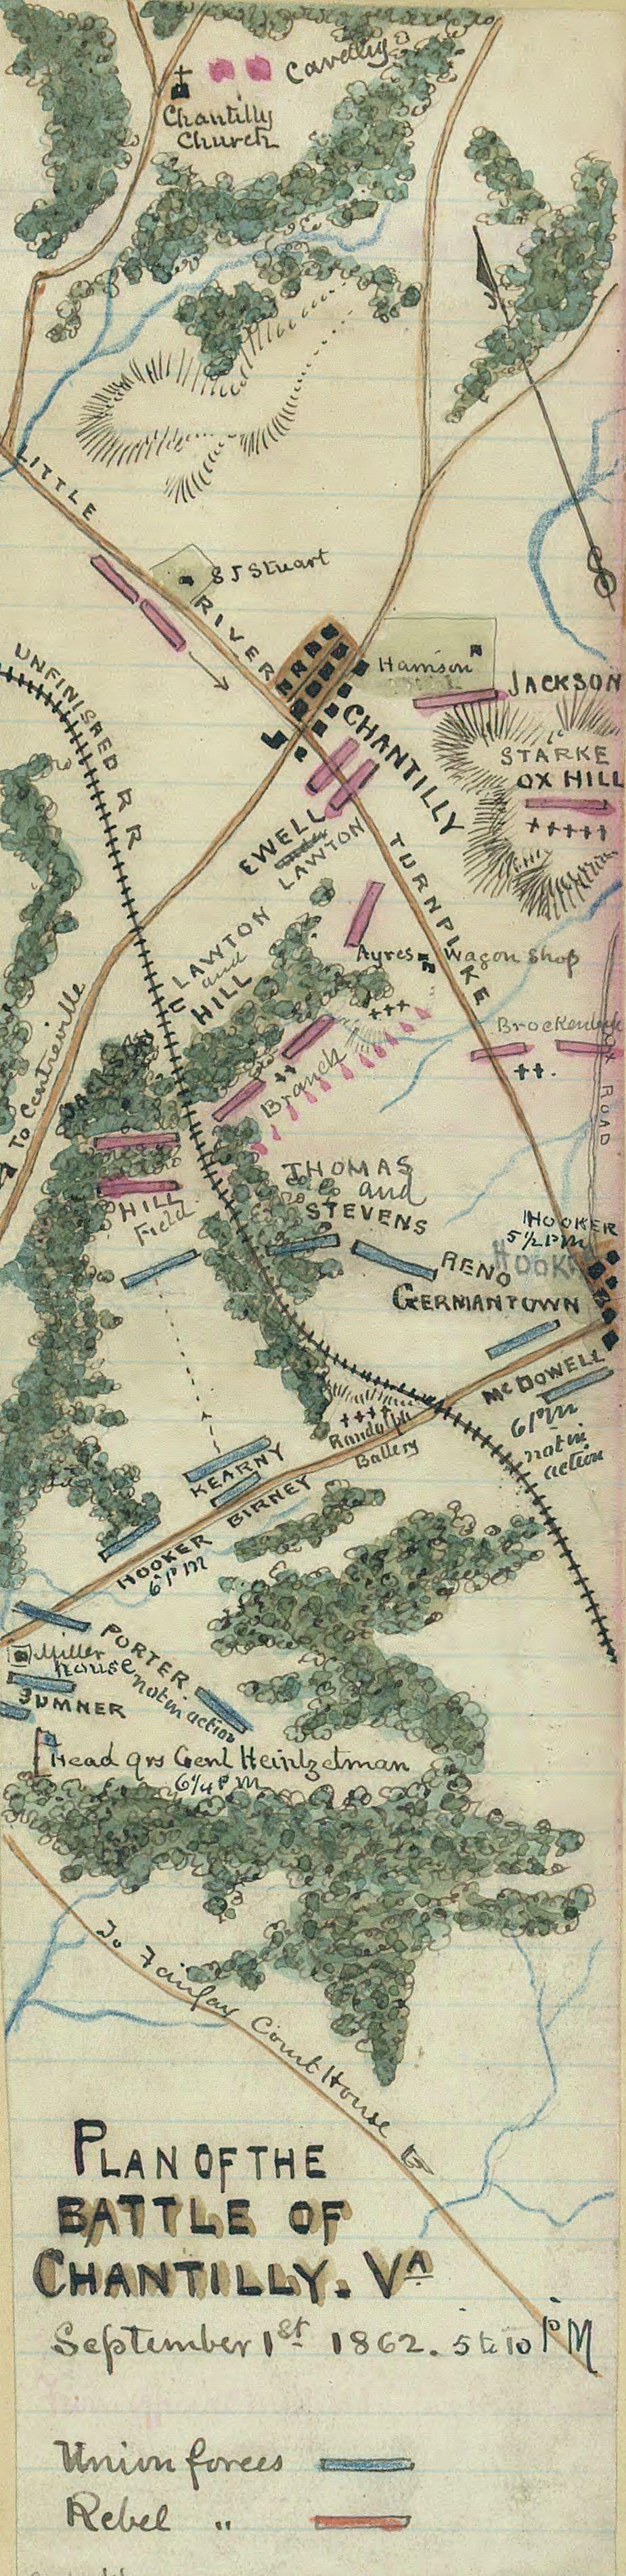 Plan of the Battle of Chantilly, Va. | American Battlefield ... Chantilly Va Map on culpeper county map, whitestone map, idylwood va map, san diego va map, hamilton va map, fairfax county map, ft a.p. hill map, jefferson va map, baltimore va map, capitol heights va map, random hills va map, tucson va map, charles town va map, woodbridge va map, st. mary's grand lake map, tyson's corner va map, westmoreland state park va map, aquia va map, middle river va map, baileys crossroads va map,